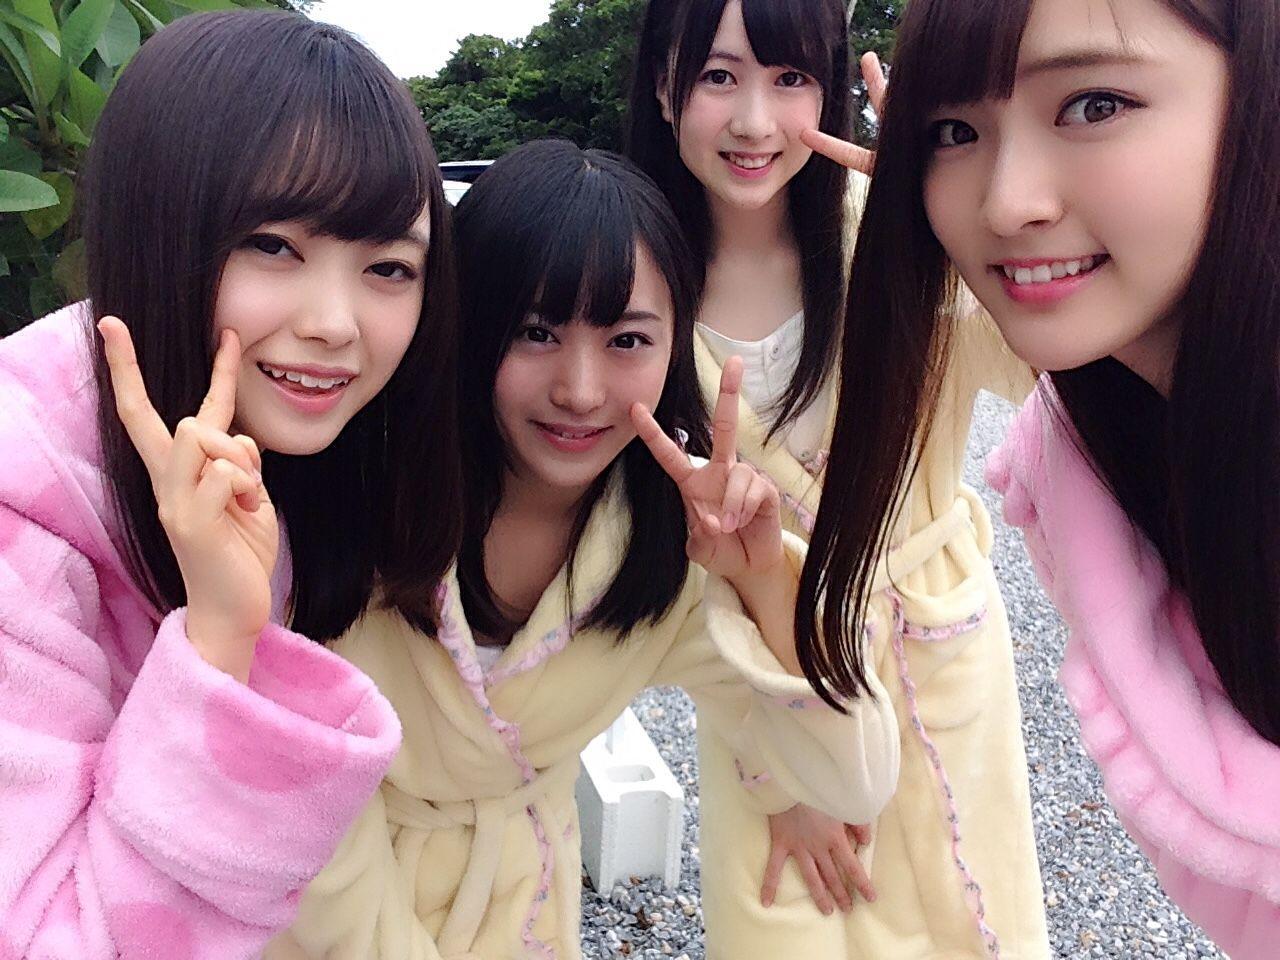 【AKB48】大森美優がテレ朝ラストアイドル企画に参加クル━━━━(゚∀゚)━━━━!!